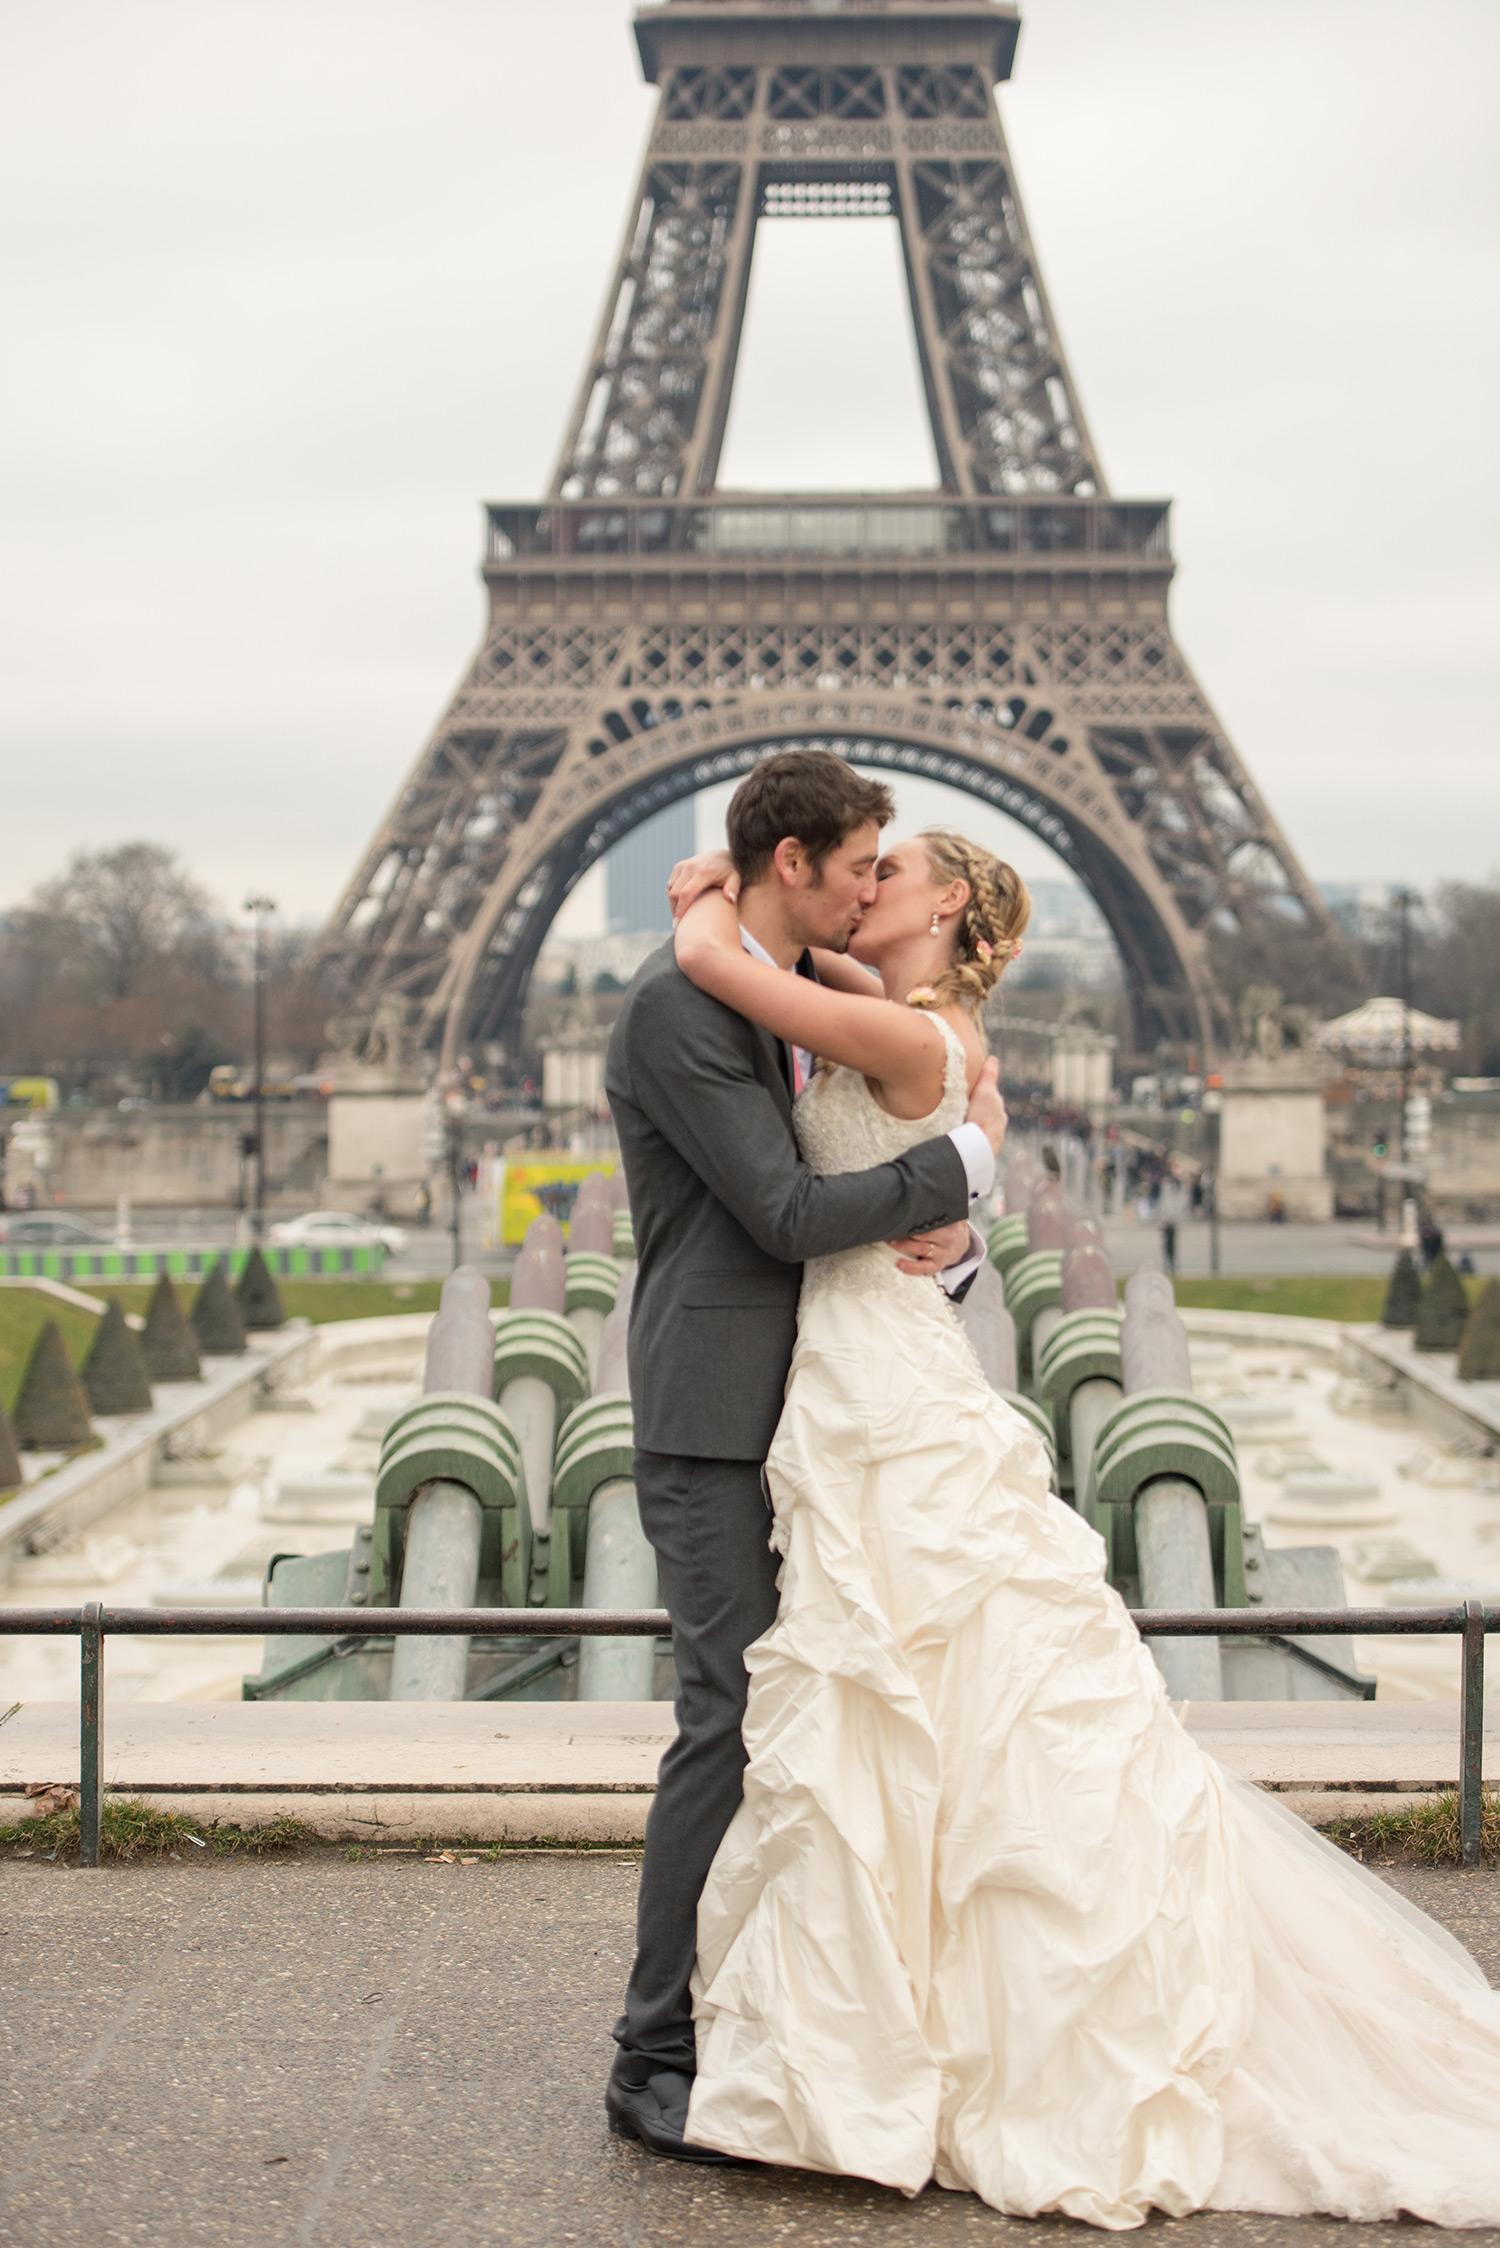 Amelia and Brett's Paris wedding